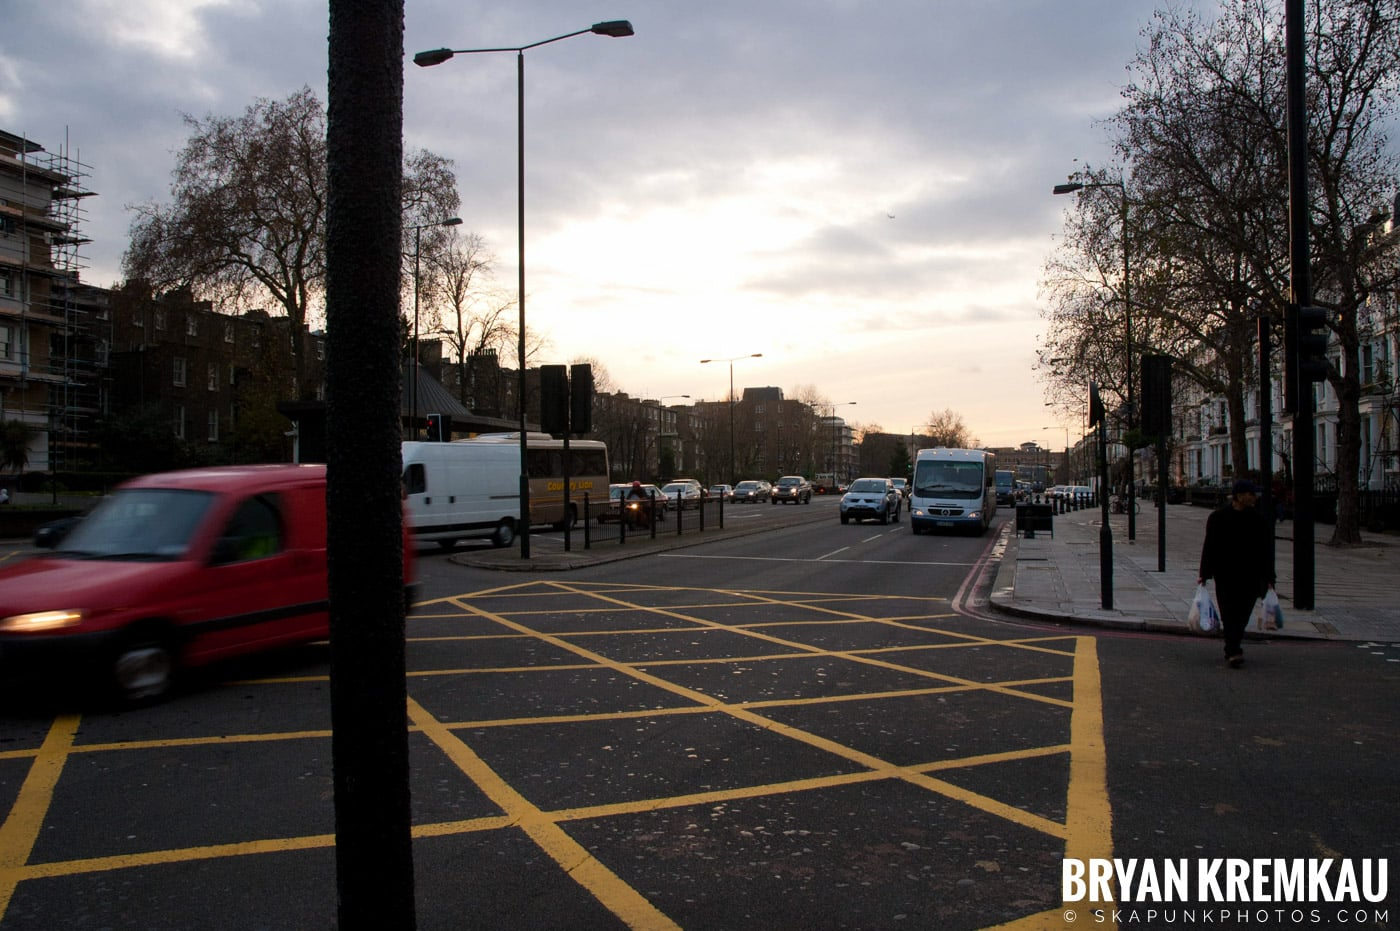 London, England - Day 1 - 12.8.06 (3)